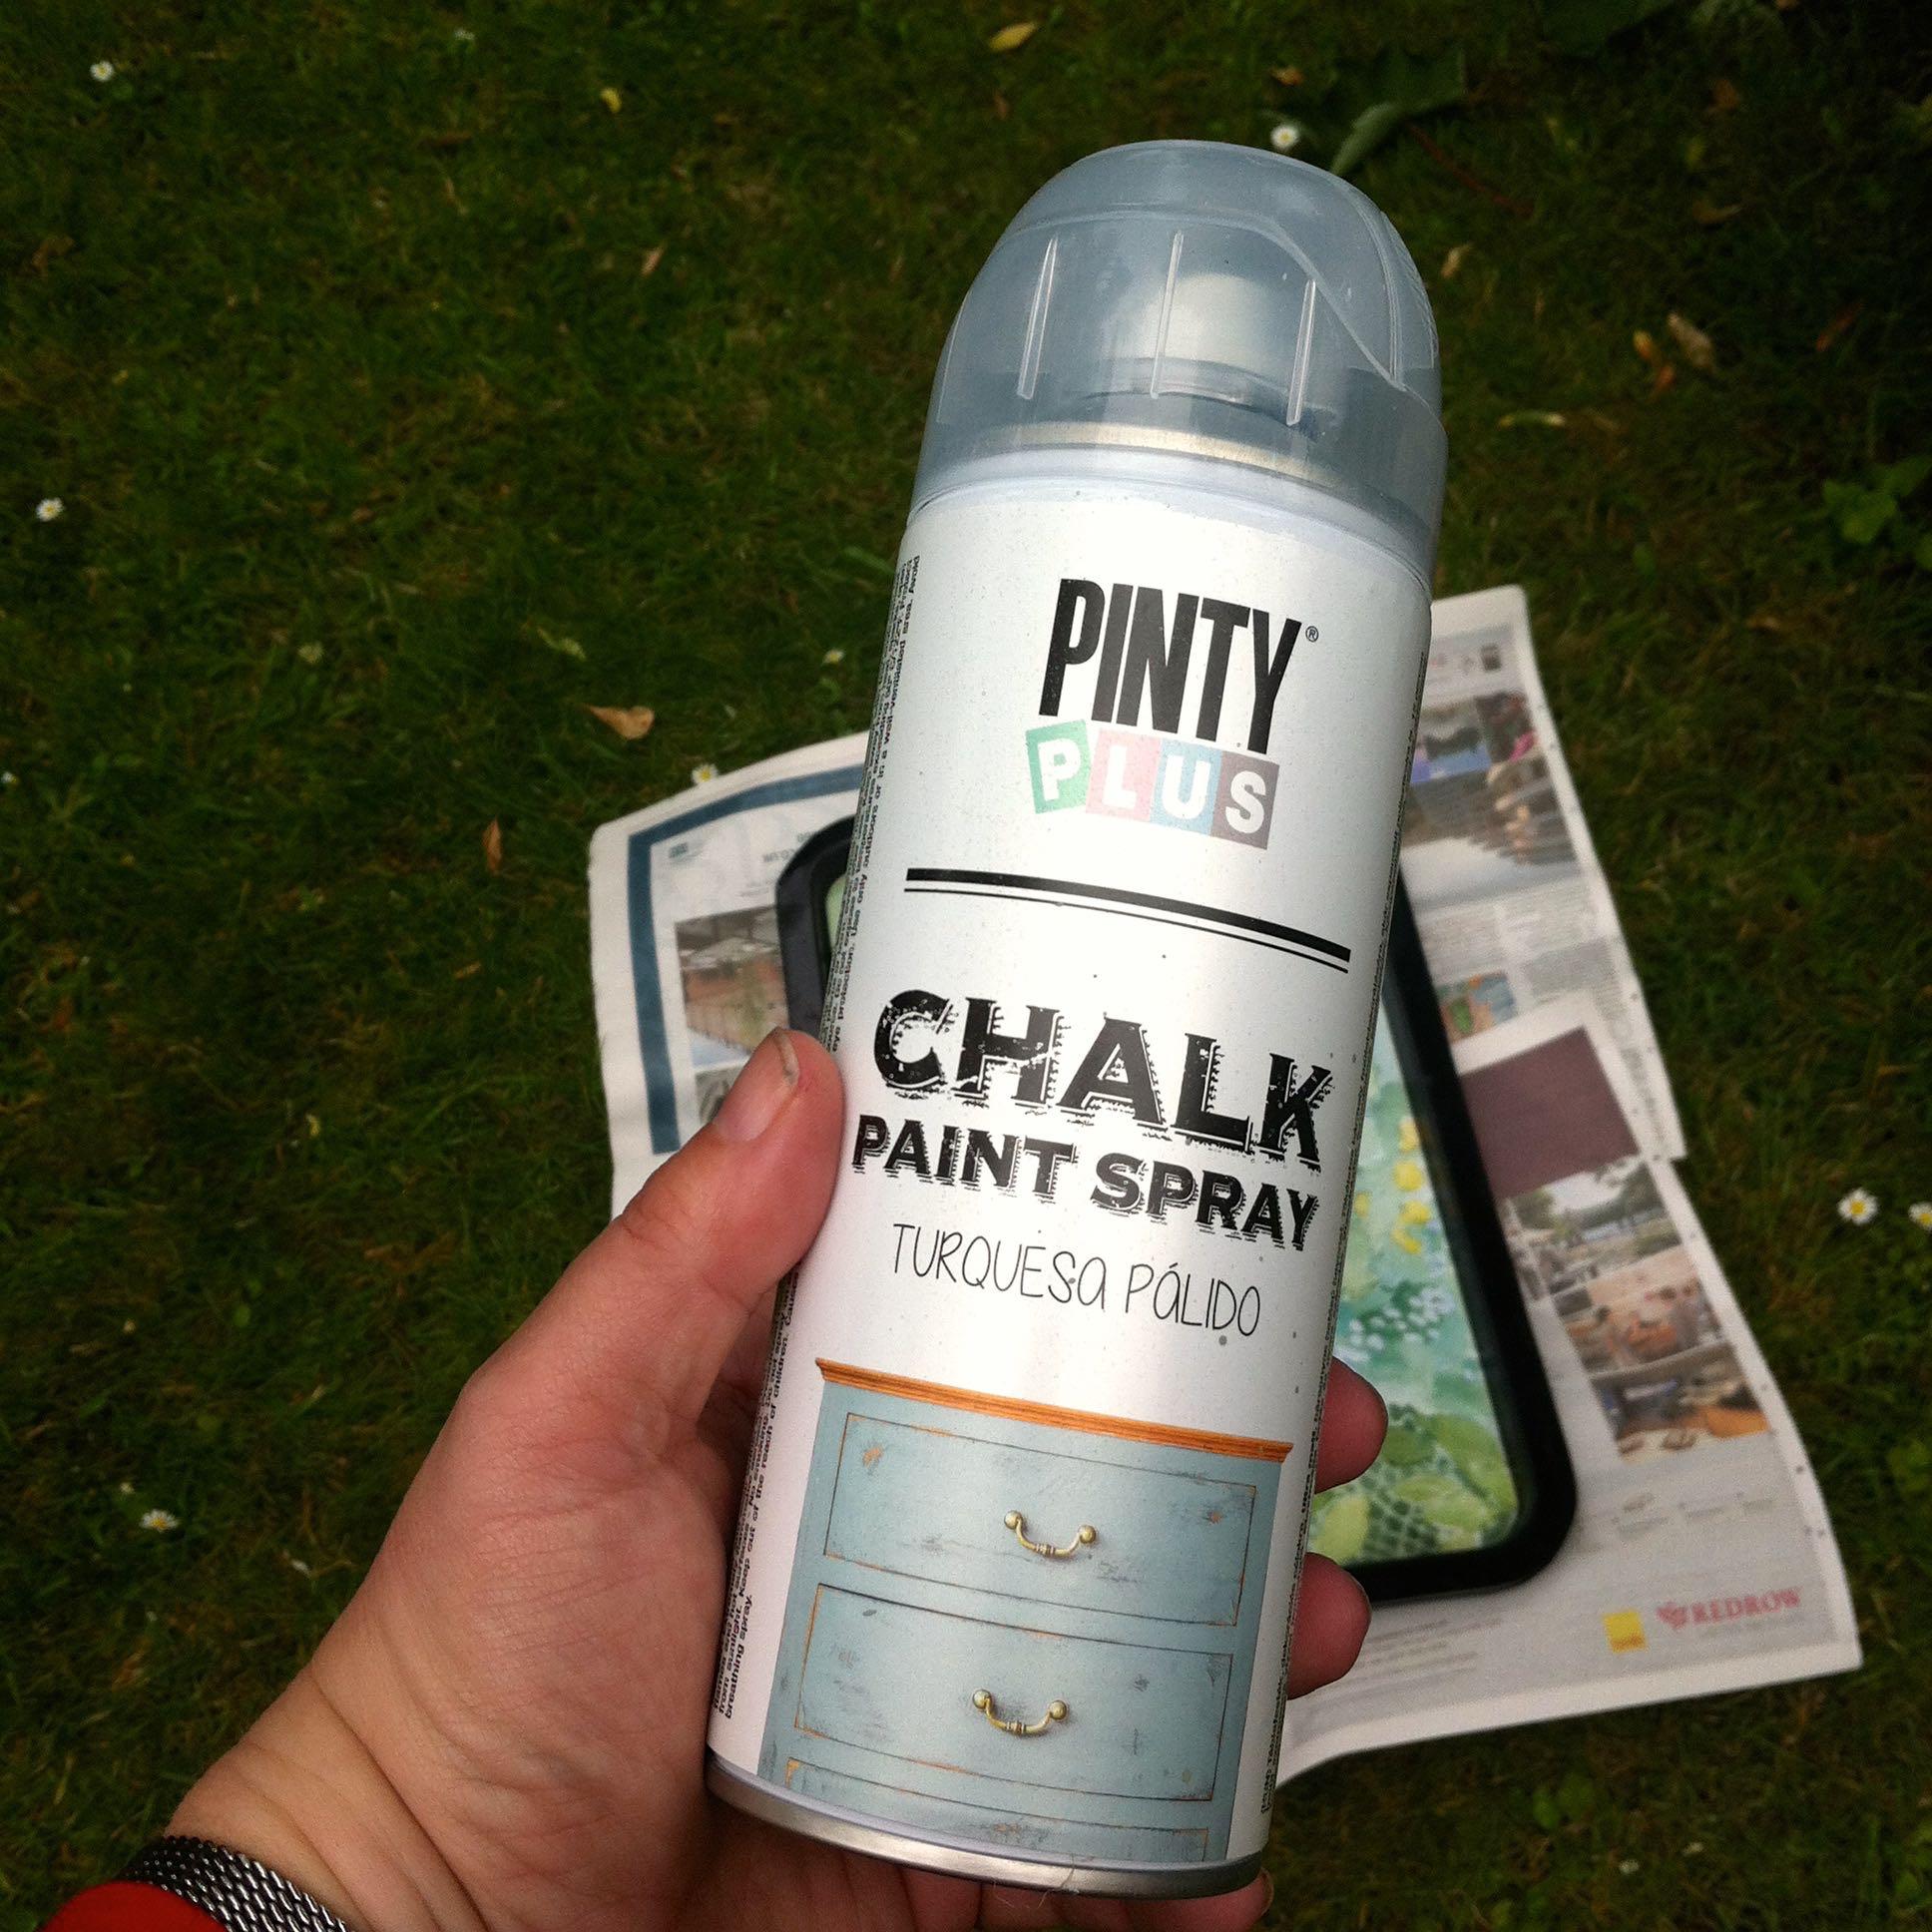 Pinty Plus Chalk Paint Spray Light Turquoise